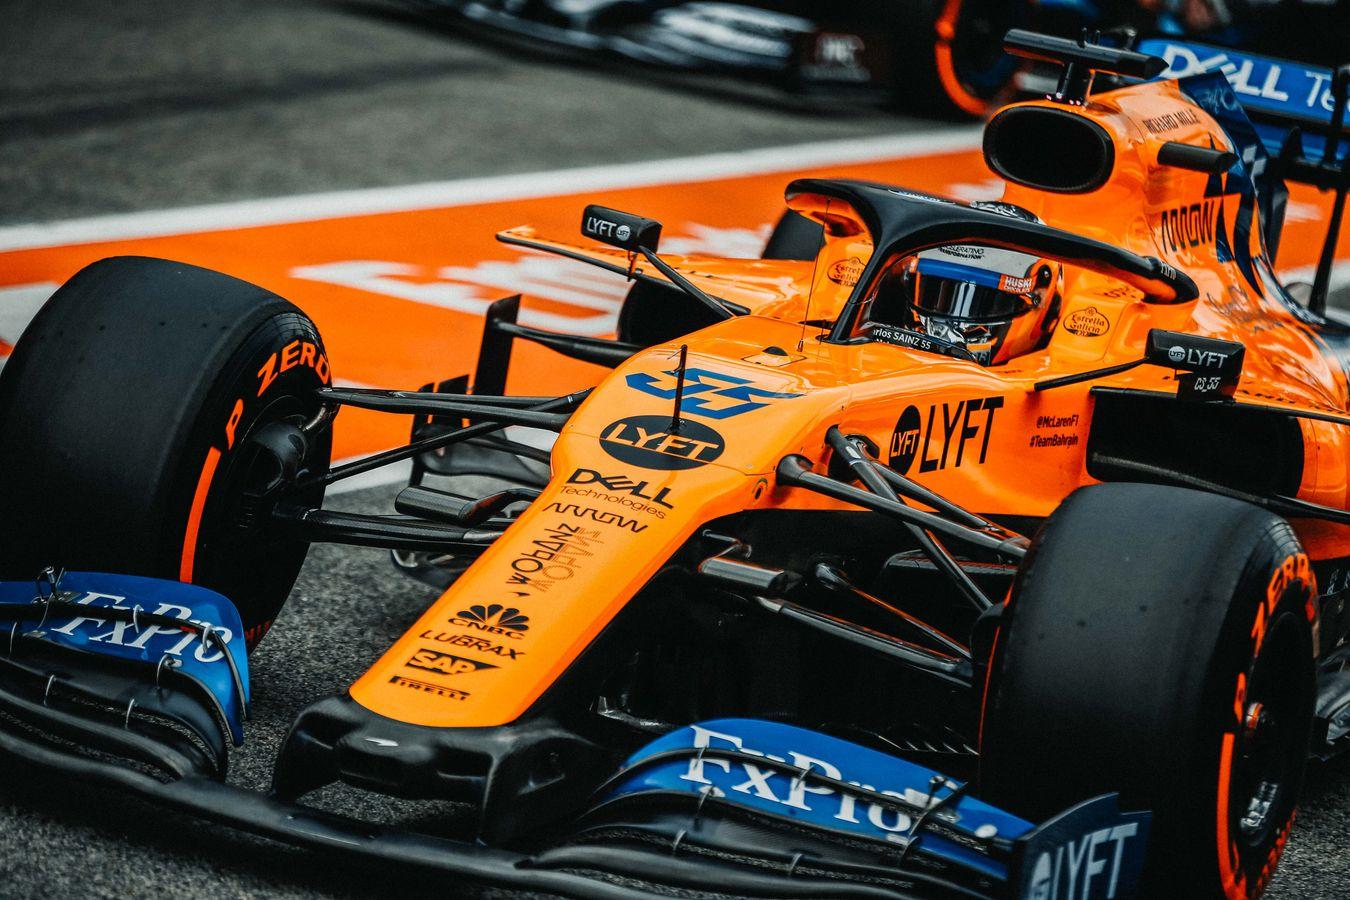 Mclaren Formula 1: 2019 Spanish Grand Prix